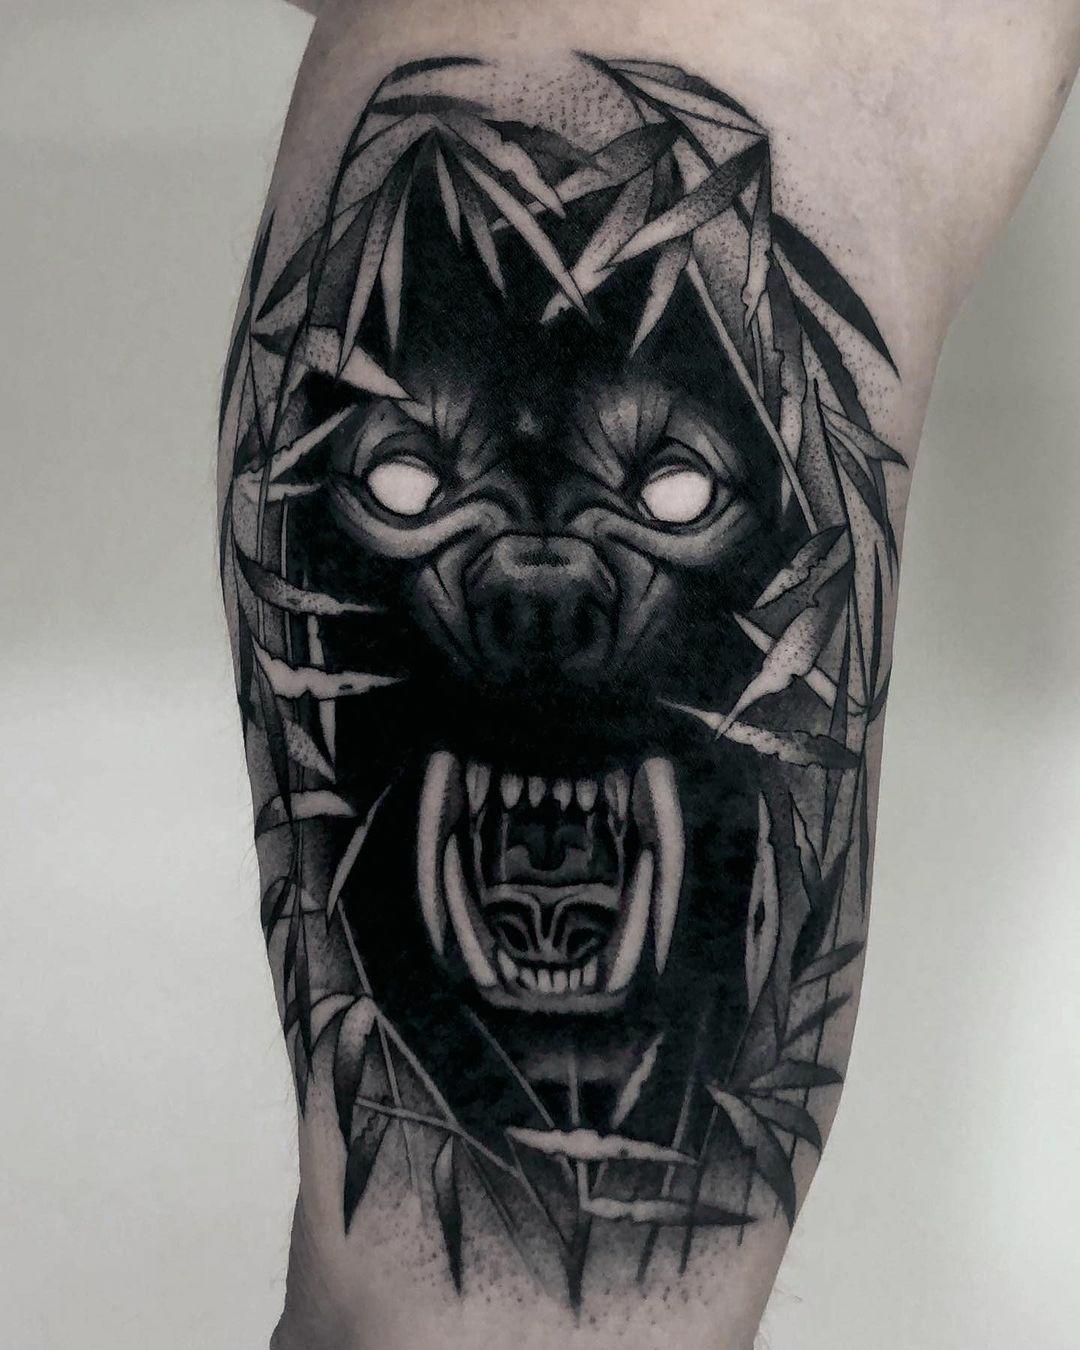 Inksearch tattoo Igor Marek